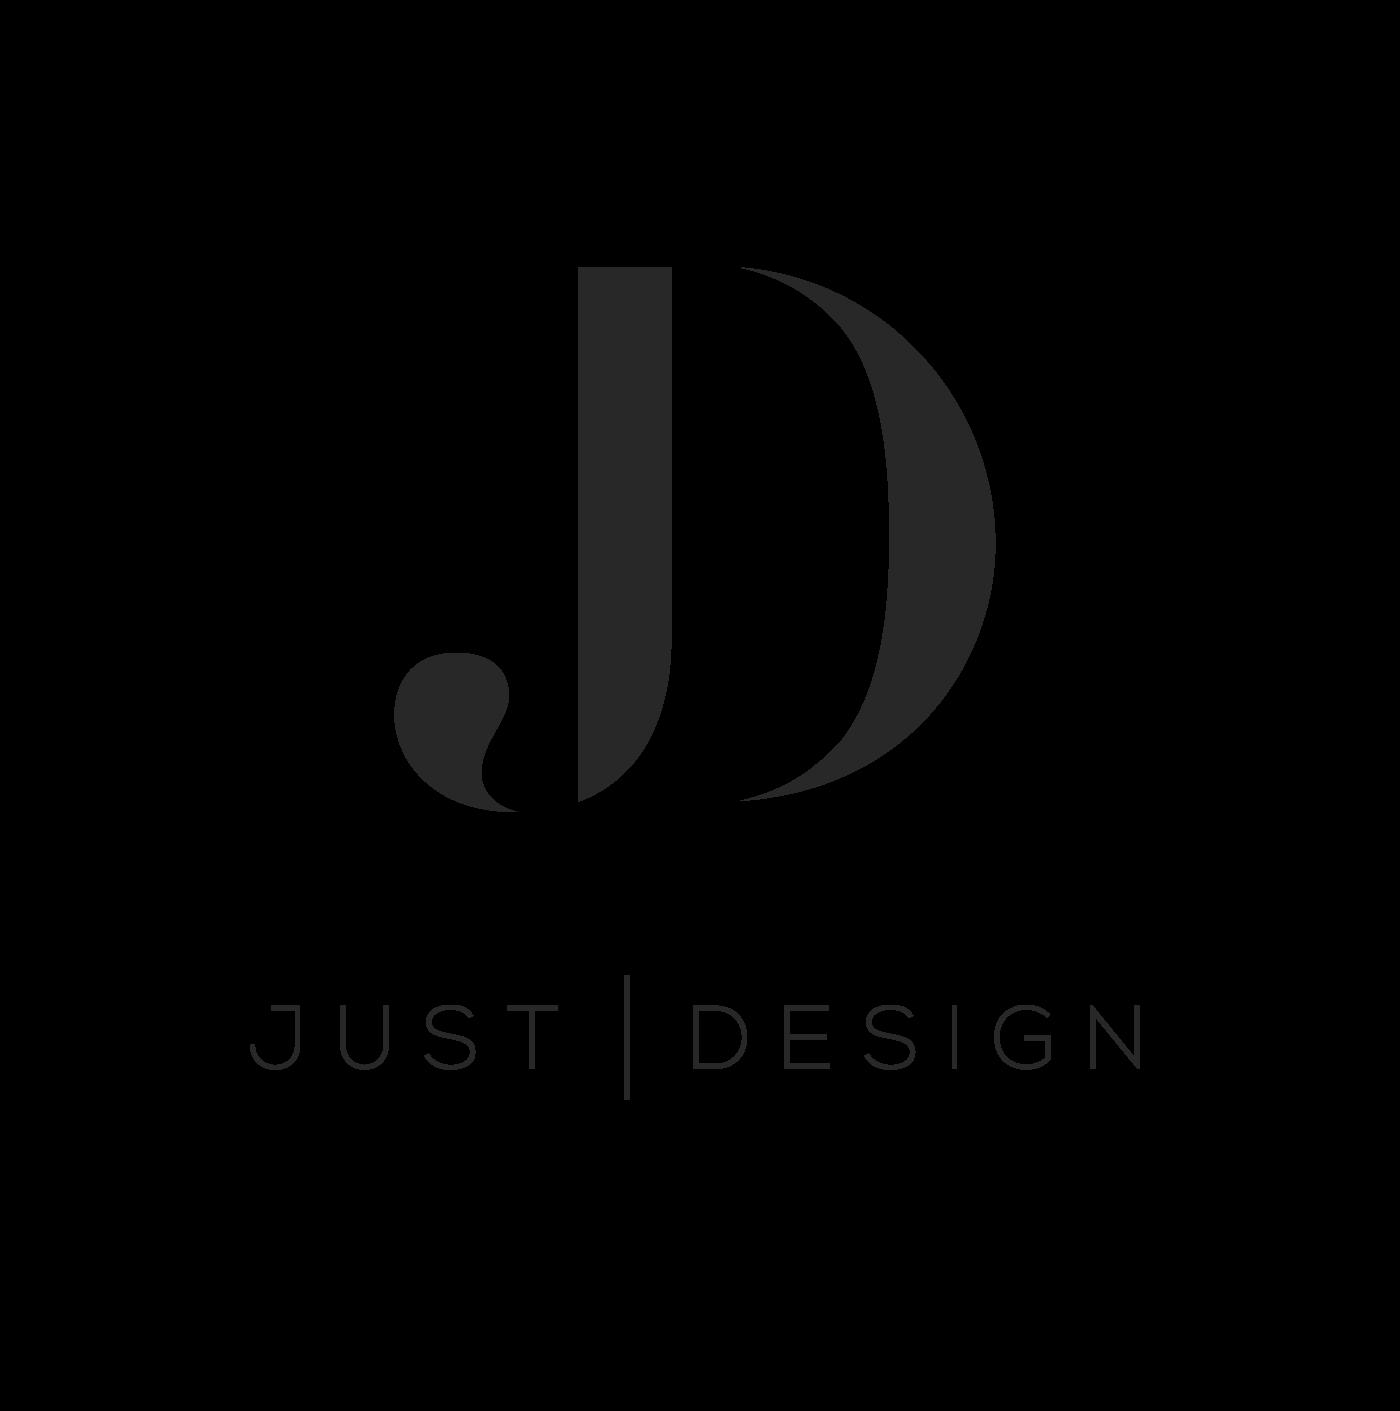 snorren justdesign logo dark